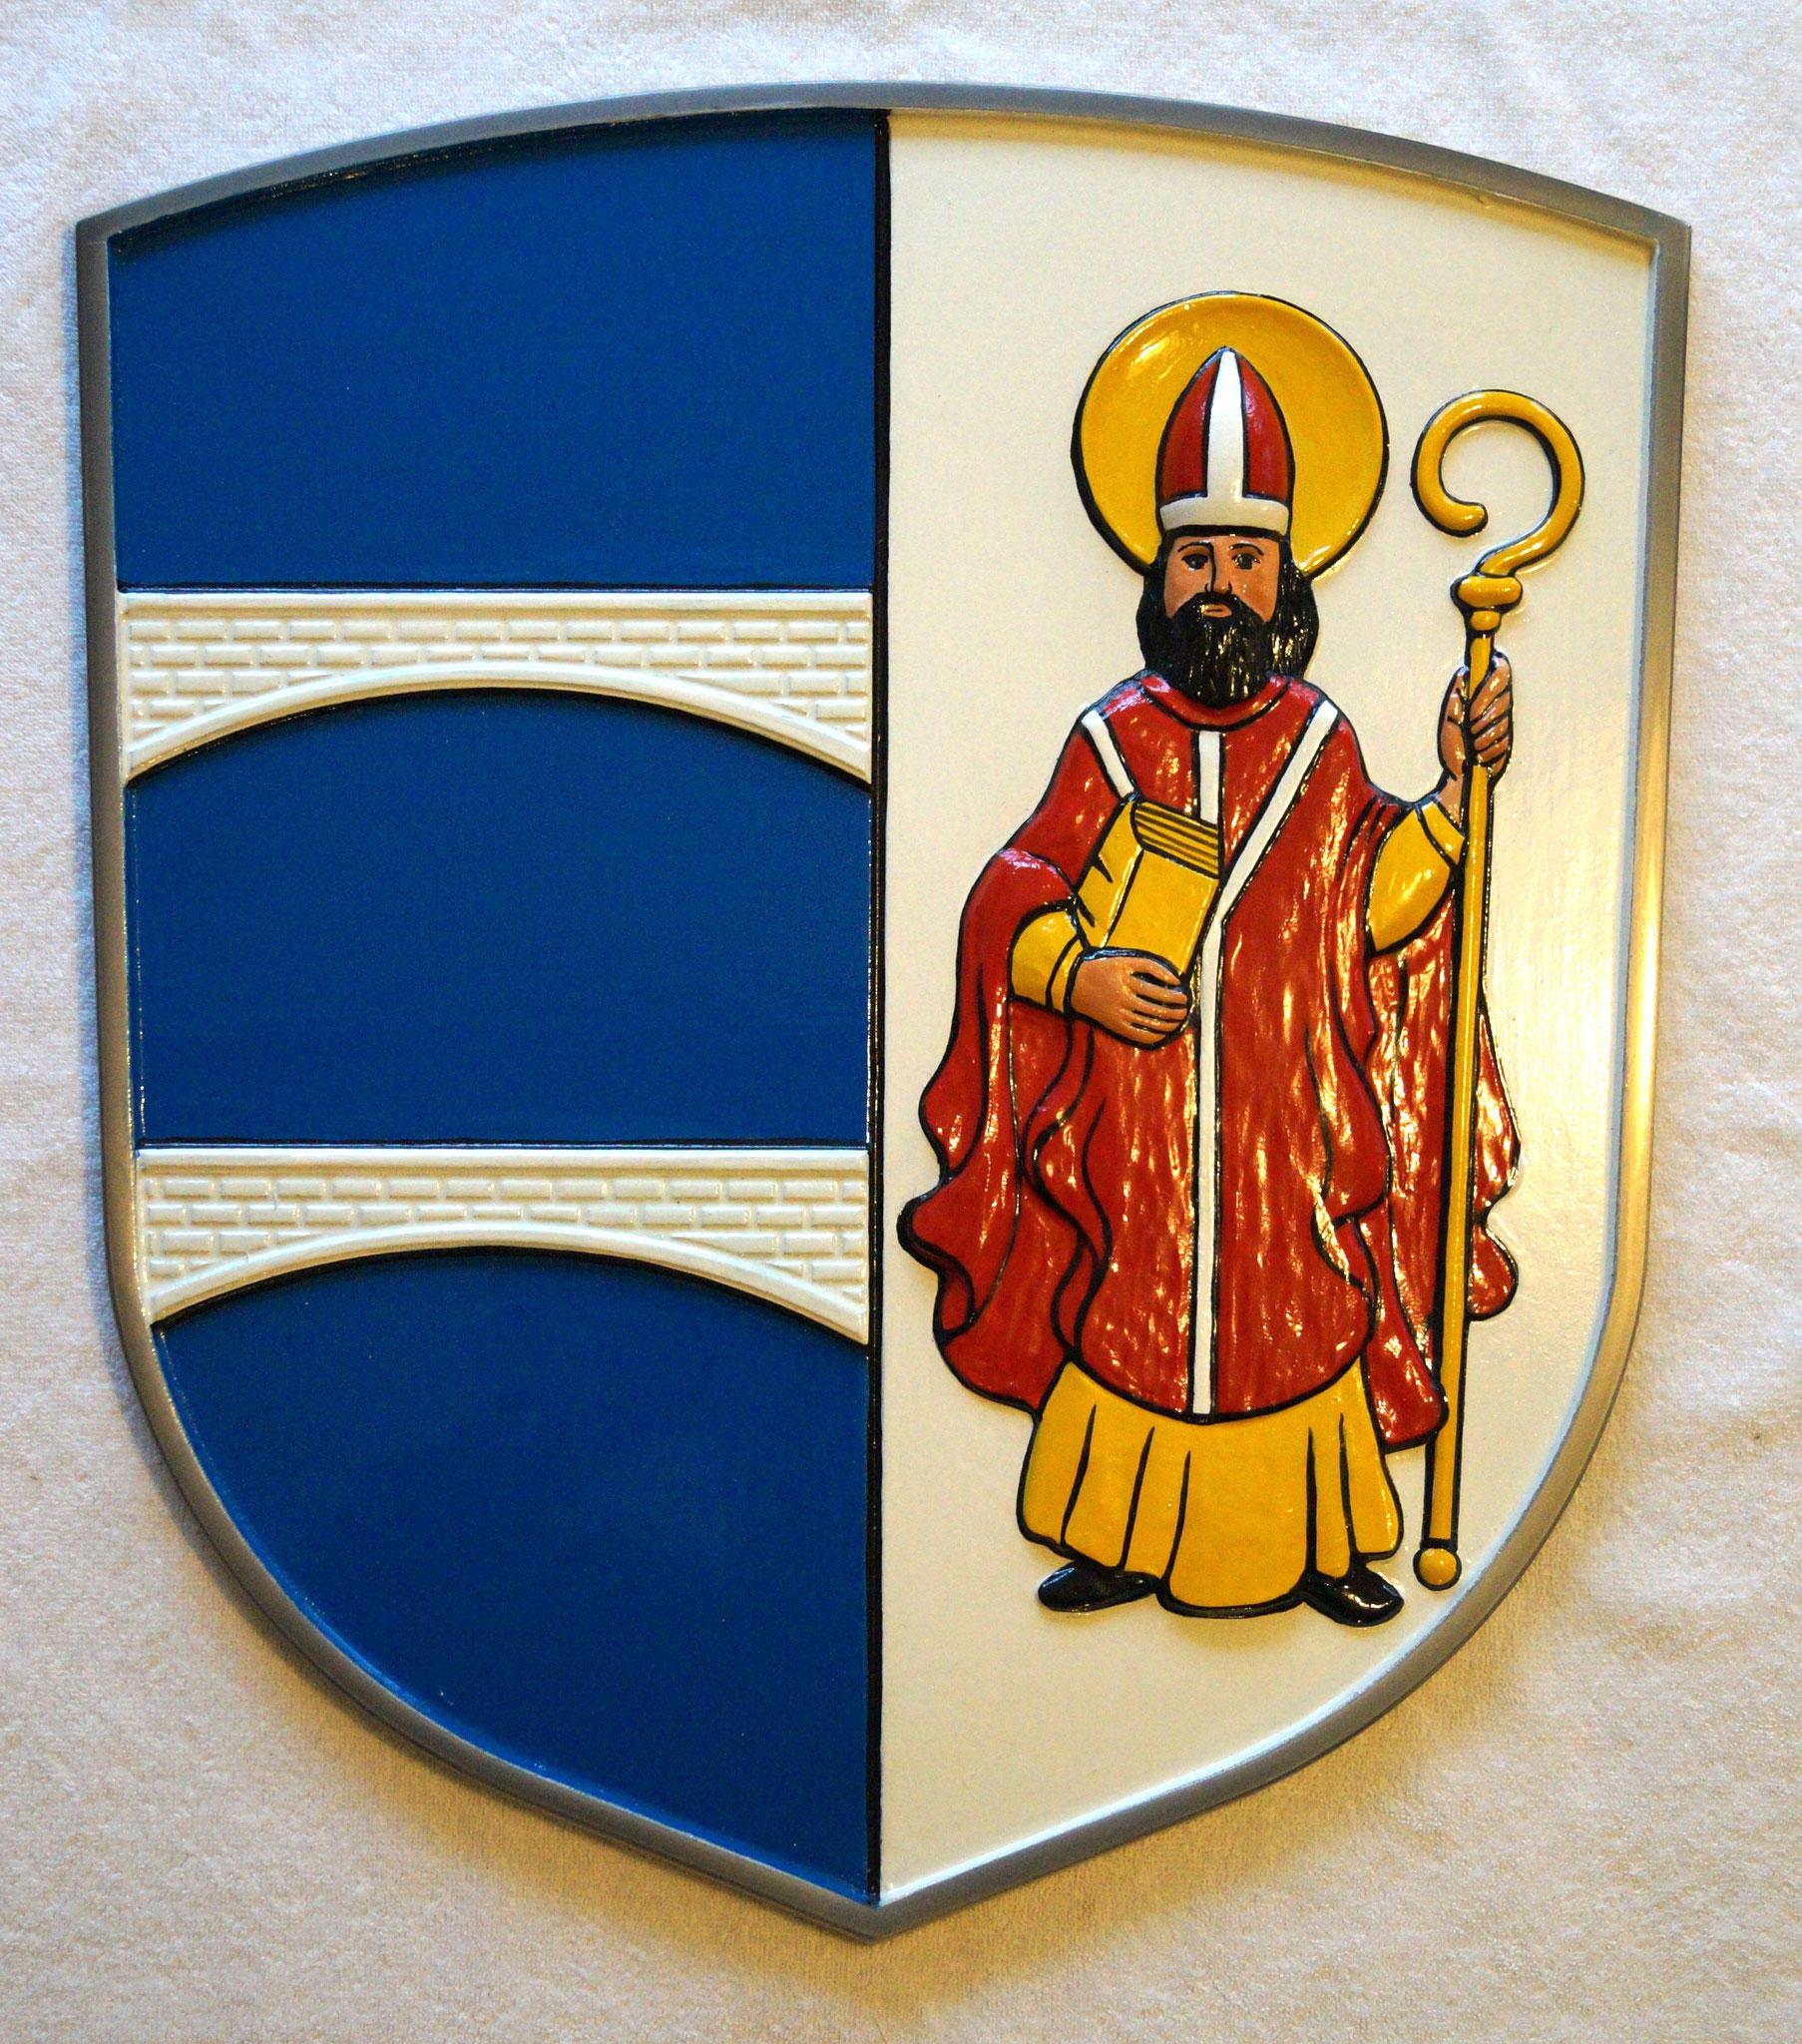 Fertiges Wappen gestrichen